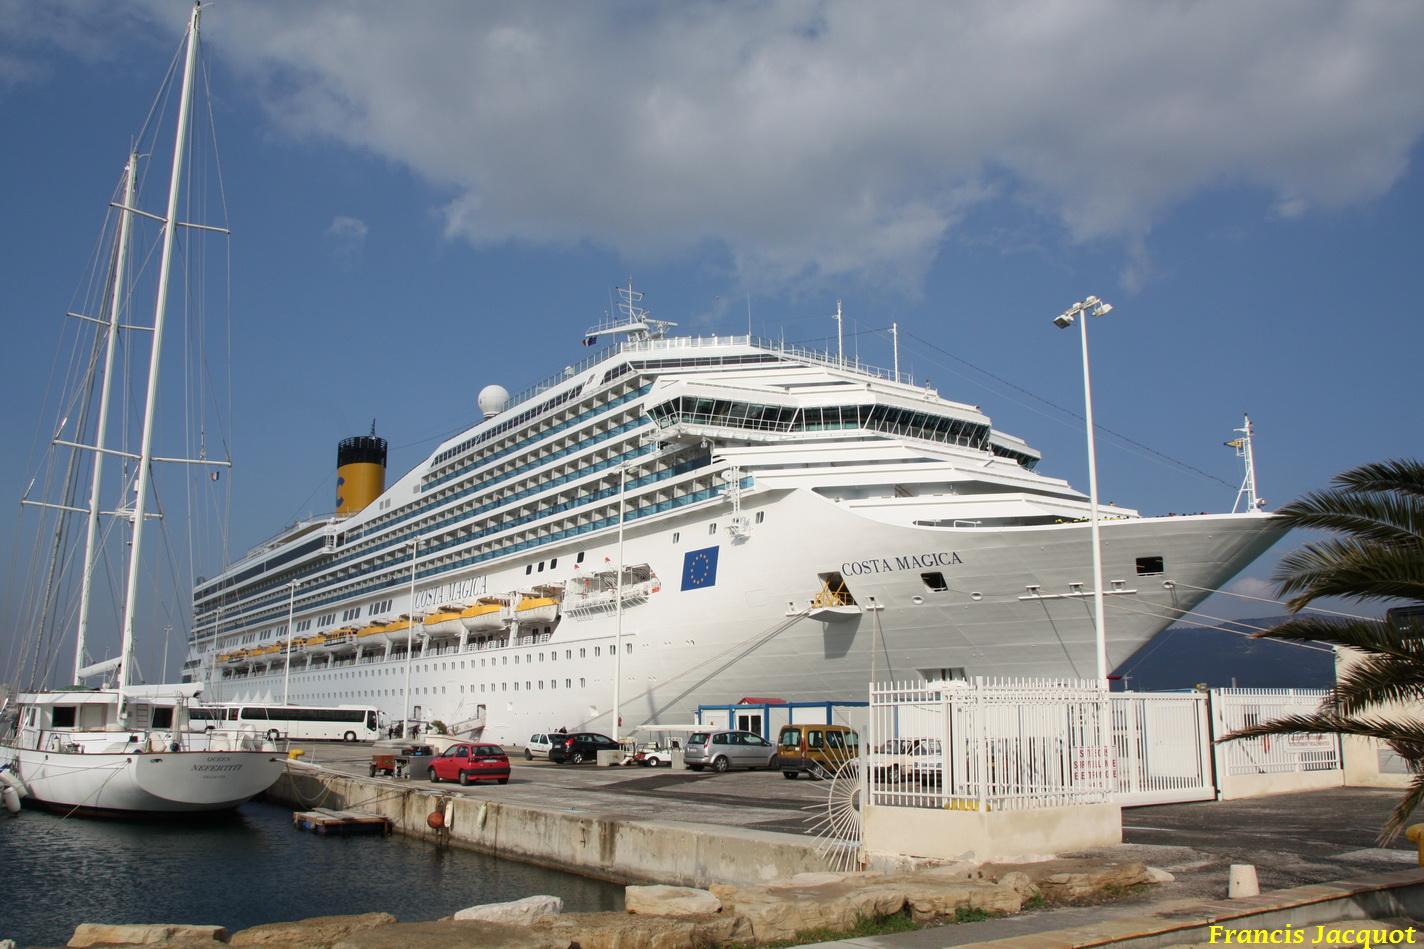 Le Costa Magica en escale à La Seyne sur Mer 0413